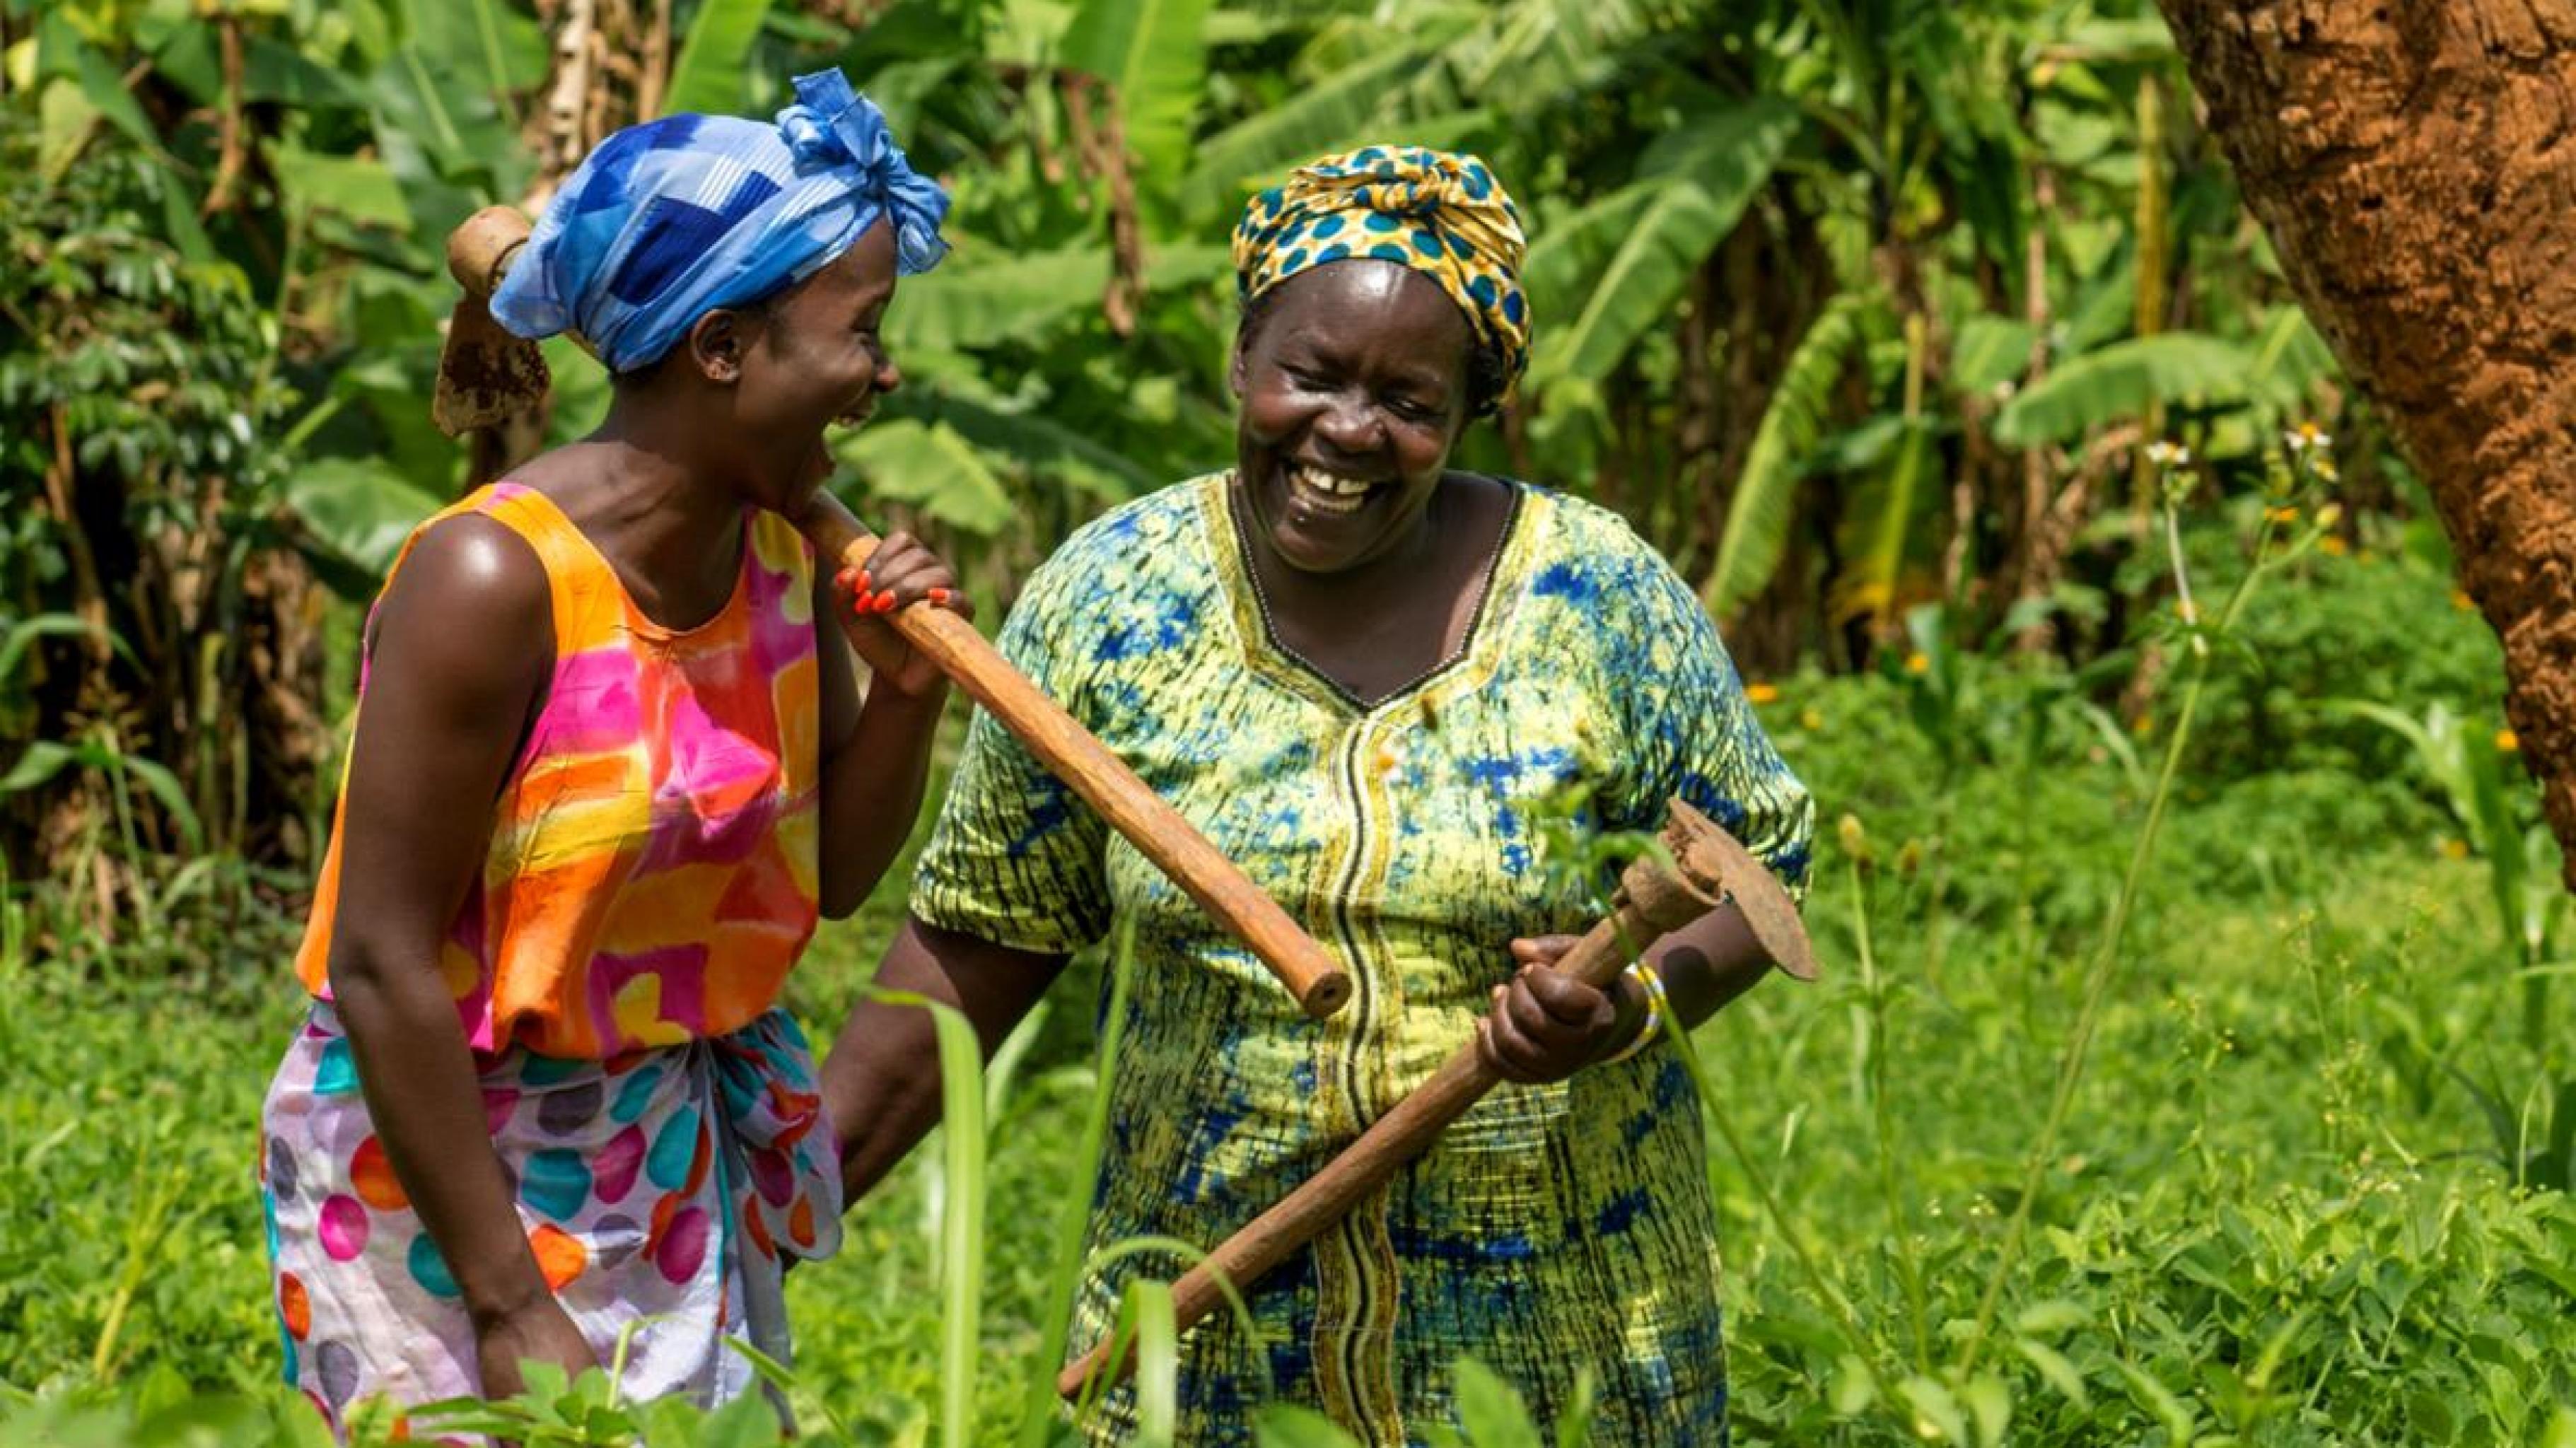 Lachende Frauen im Garten in Uganda